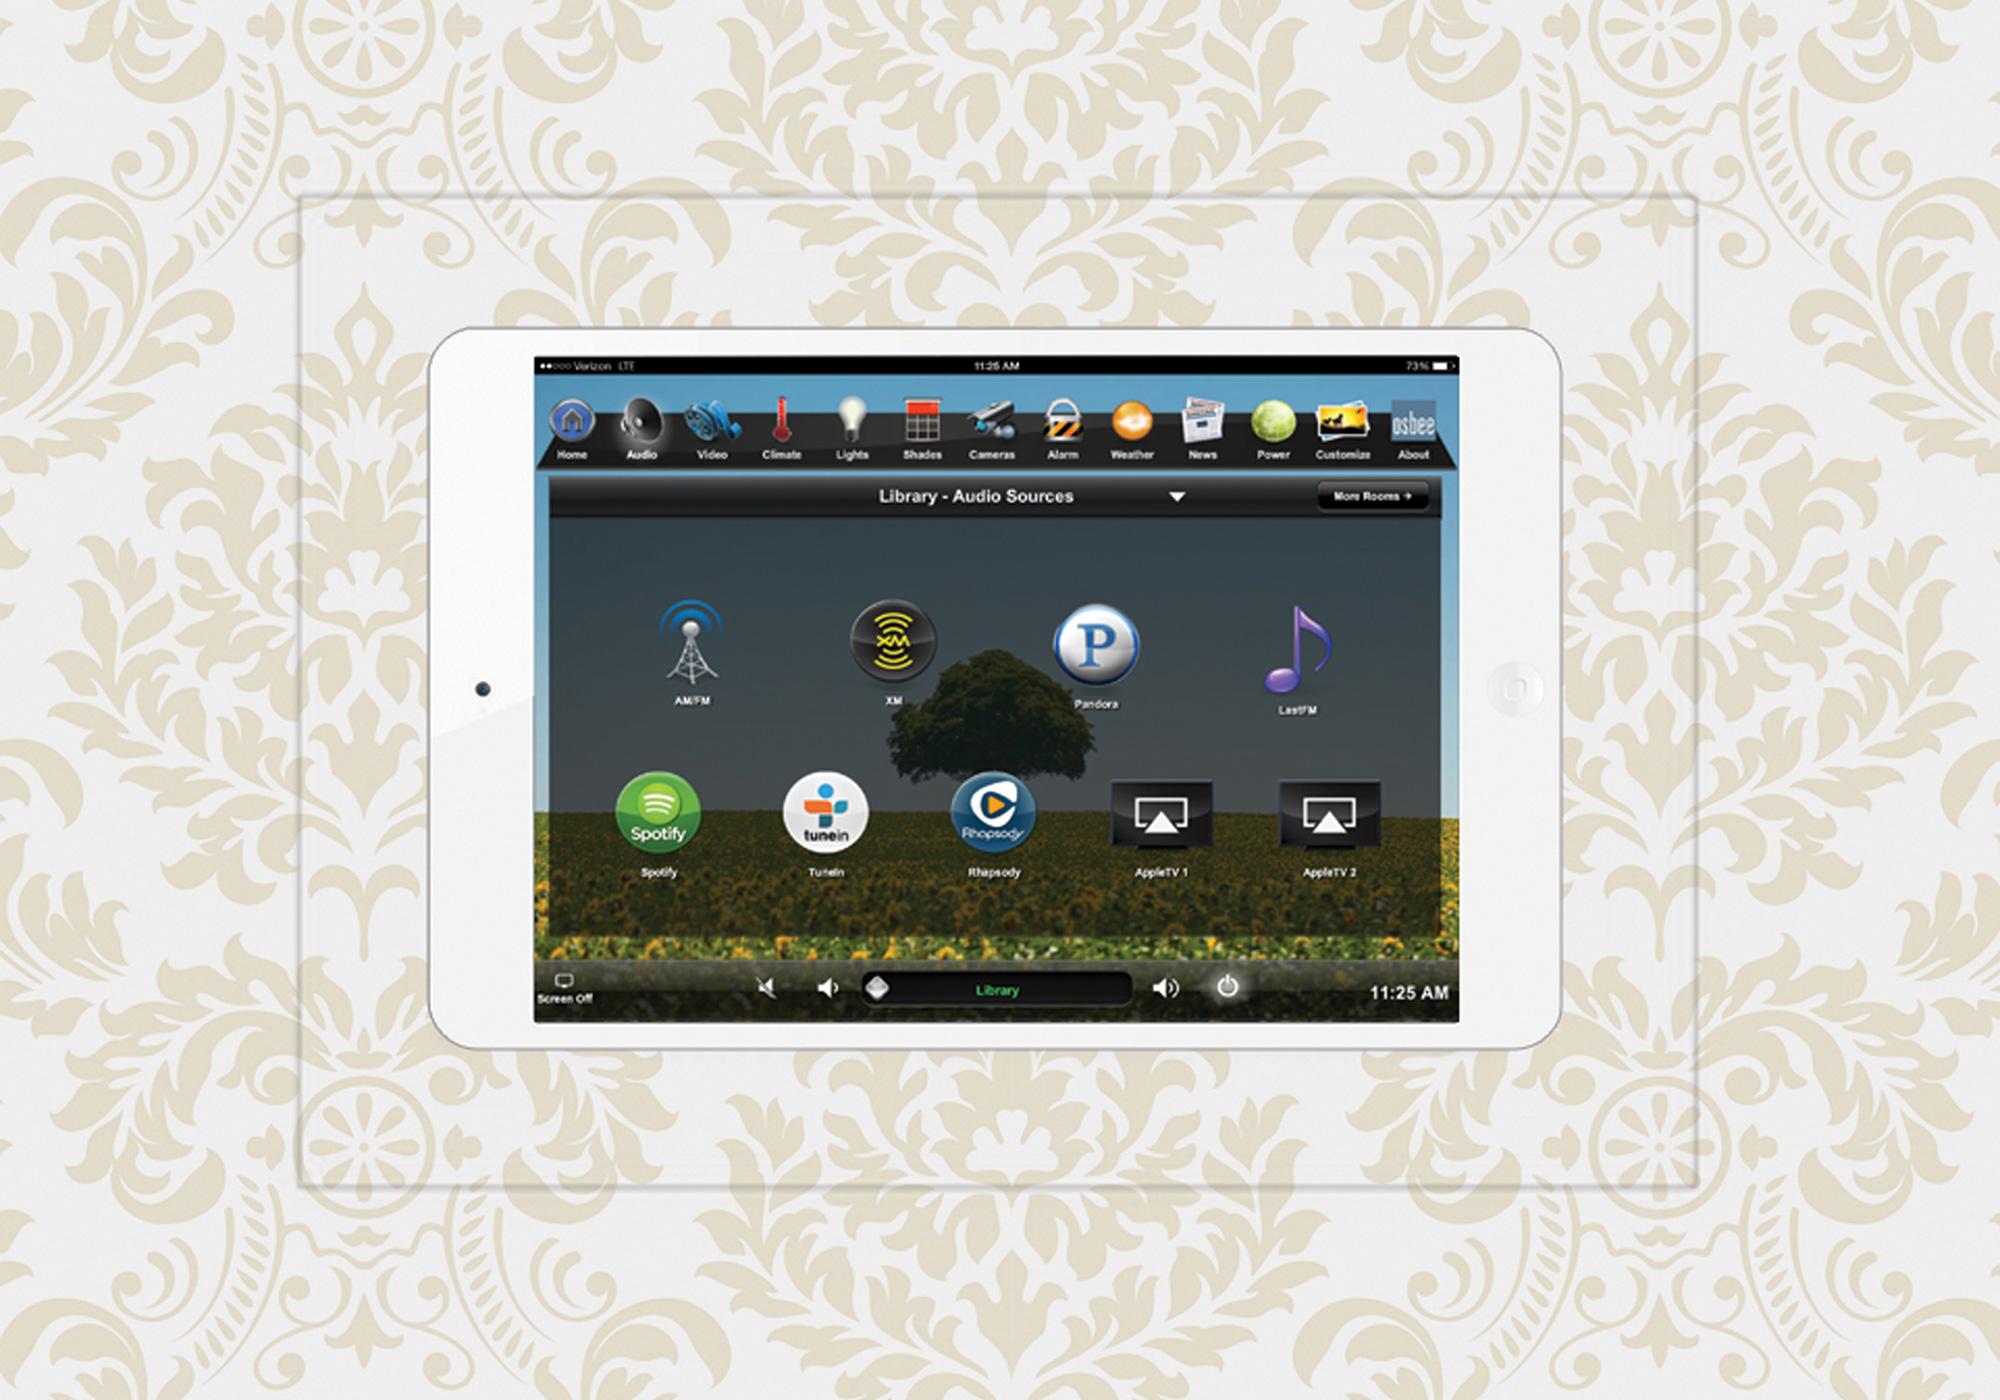 TruFig, flush-mount, iPad, wall-mount, wallpaper, audio screen